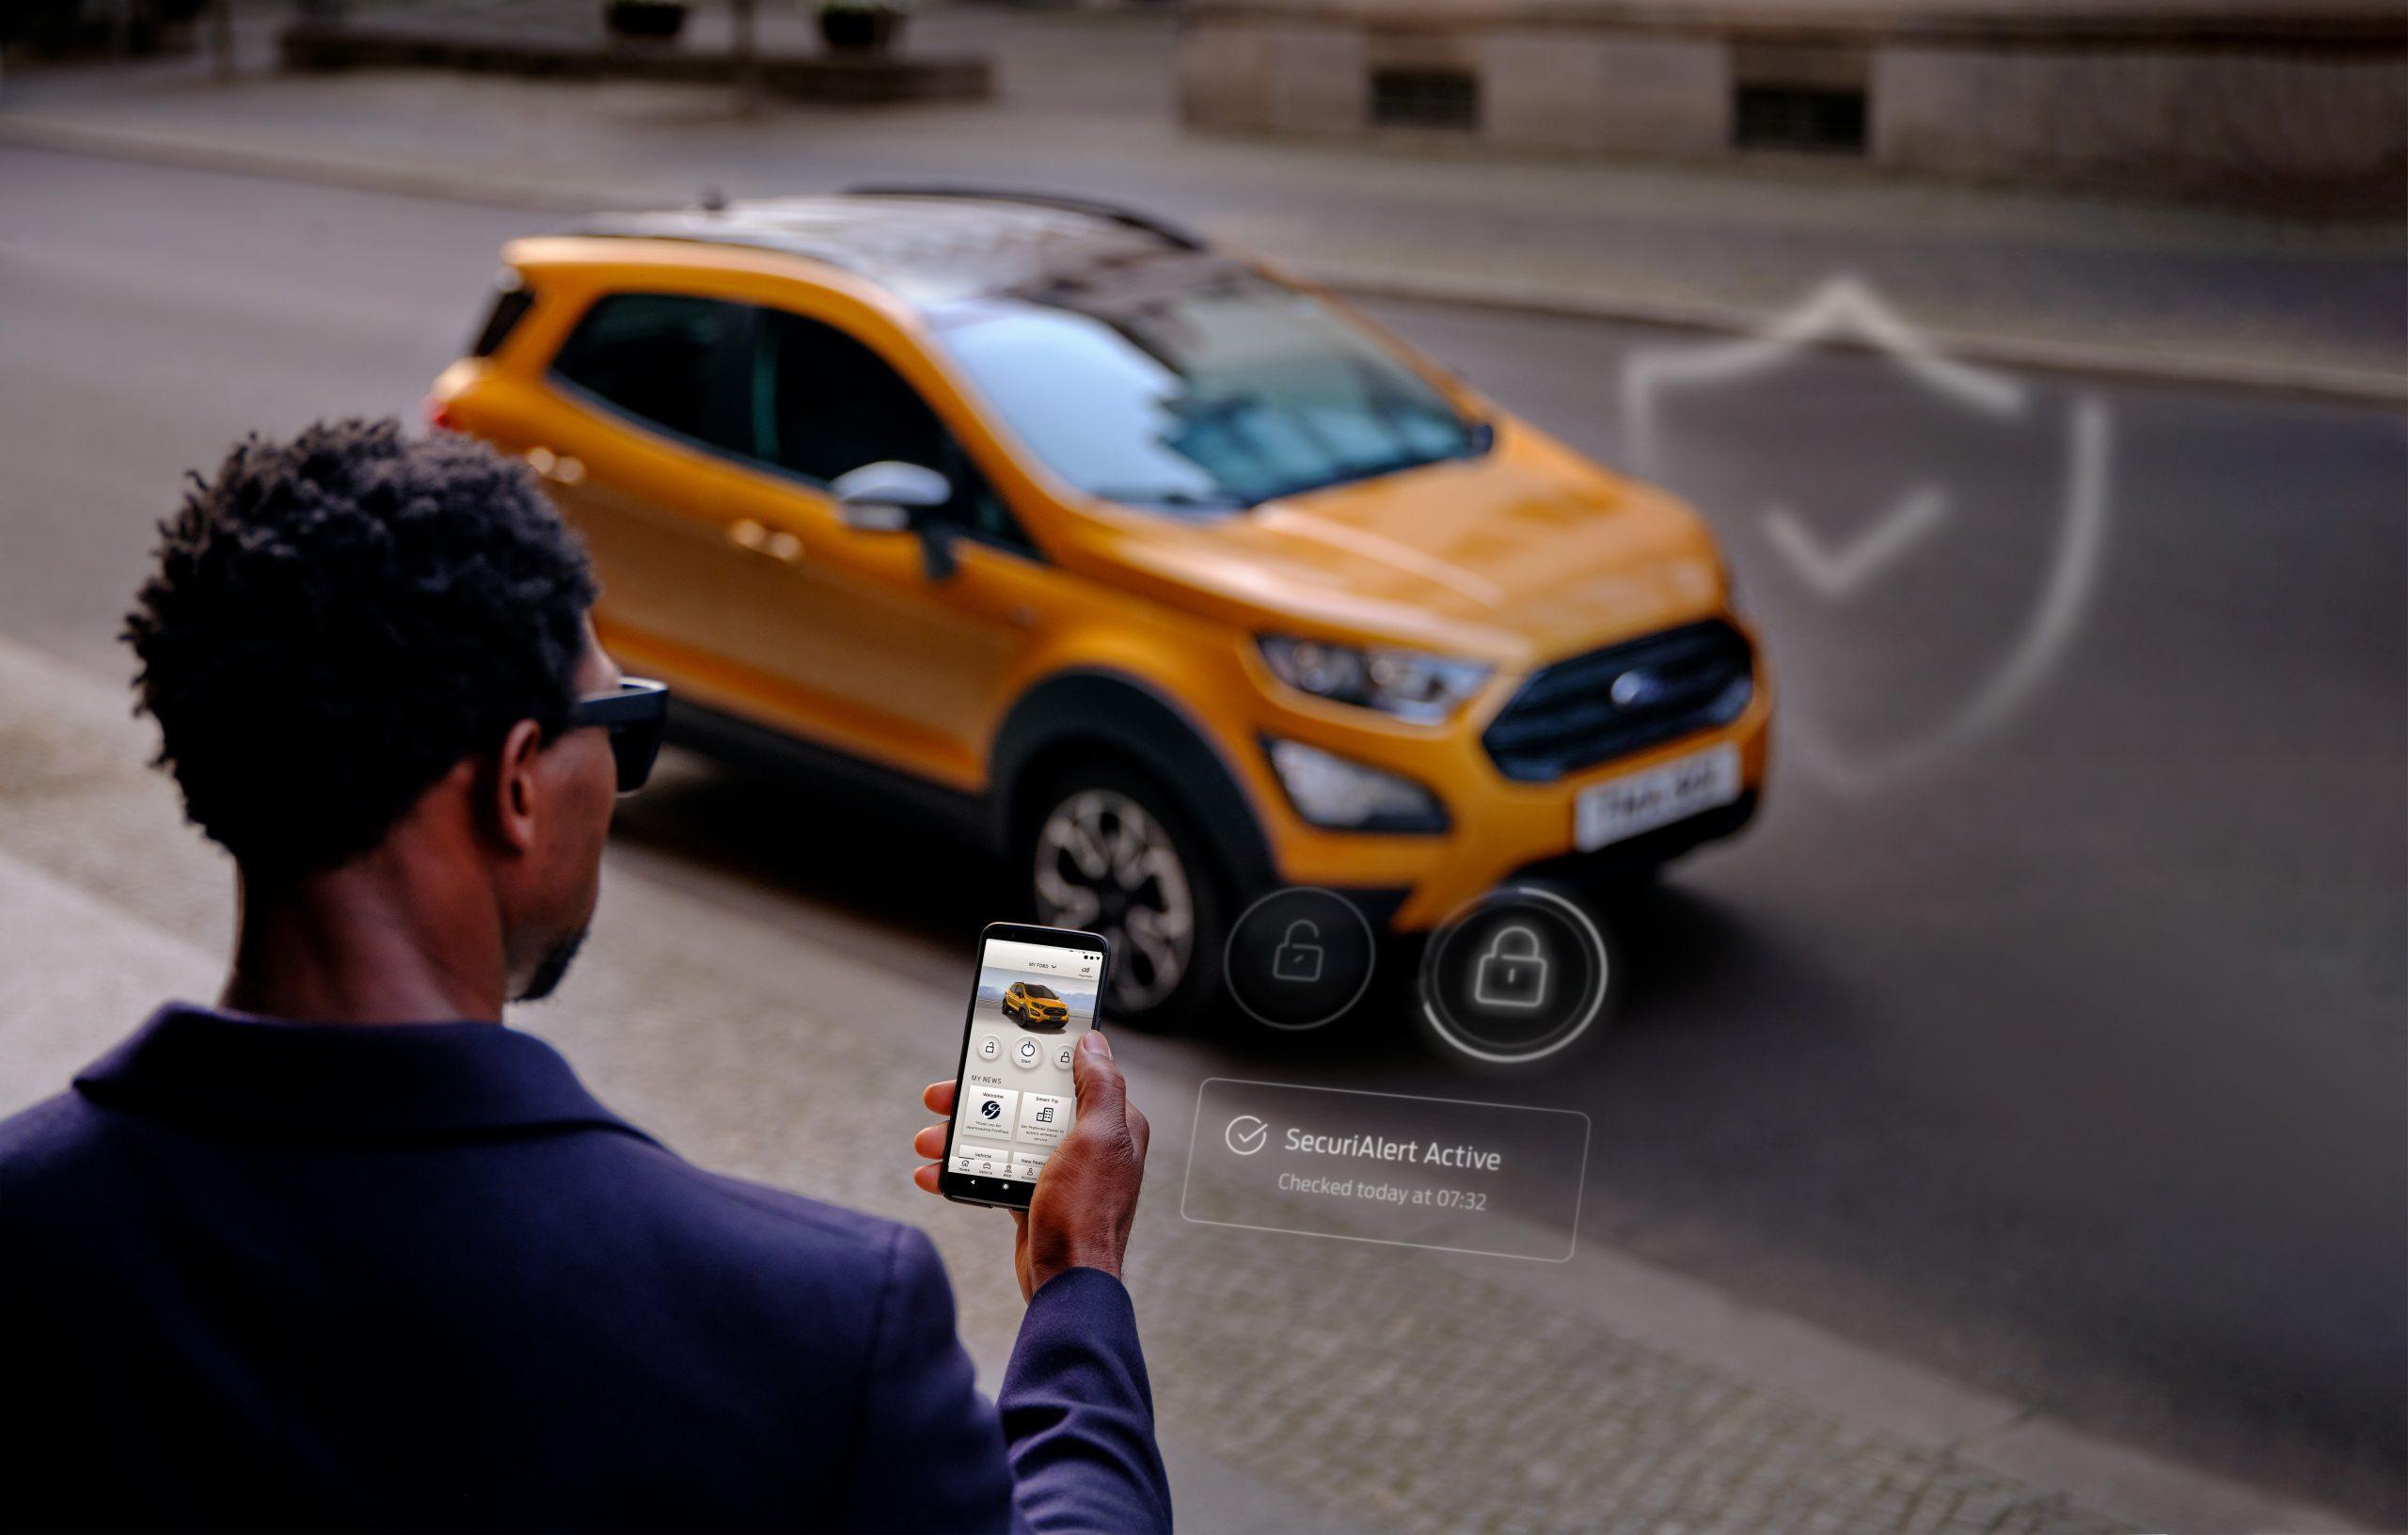 FordPass EcoSport SecuriAlert scaled Ford SecuriAlert : Ό,τι και αν συμβεί, θα σε ειδοποιήσει! Ford, ειδήσεις, Νέα